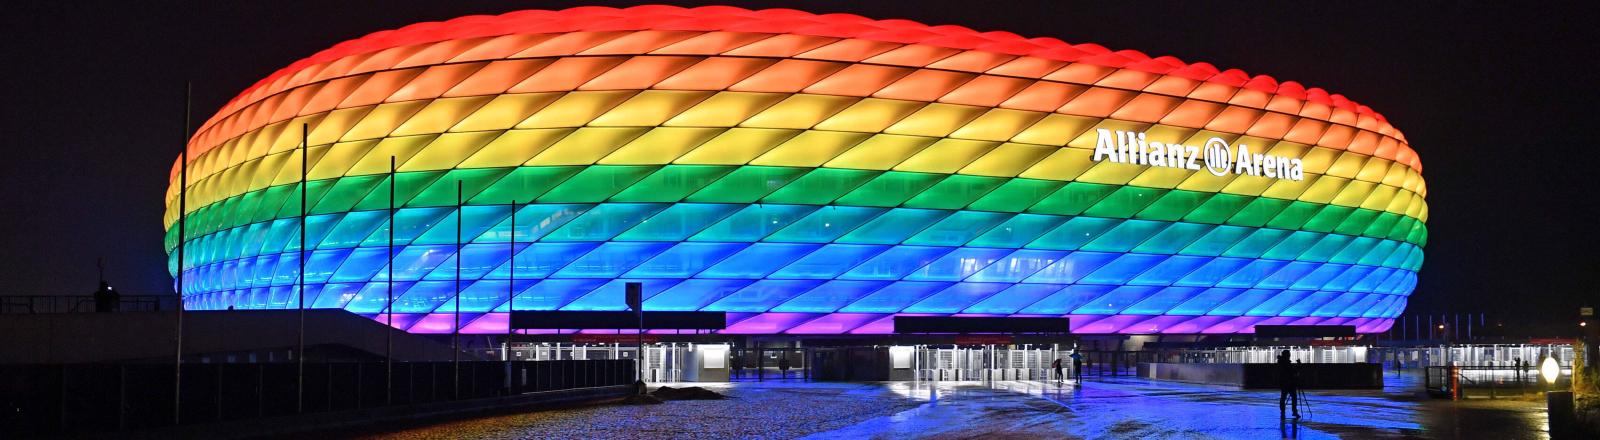 Die Allianzarena in München in Regenbogenfarben